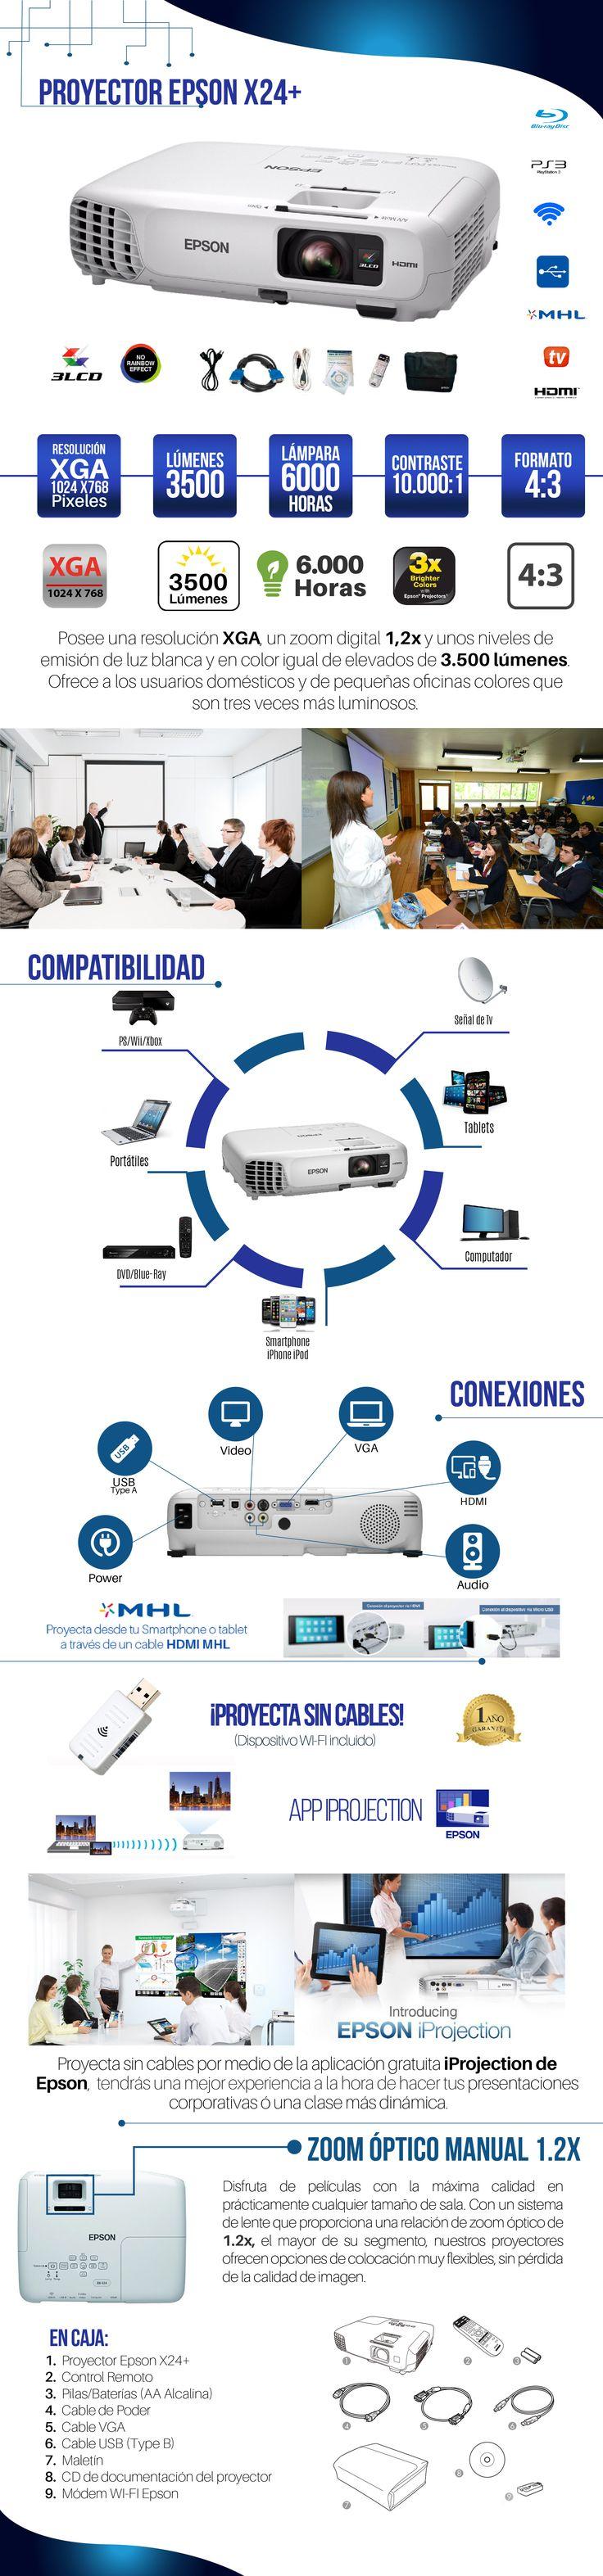 Proyector Epson X24+ 3500 Lumens Hdmi Wifi Video Beam Maleta